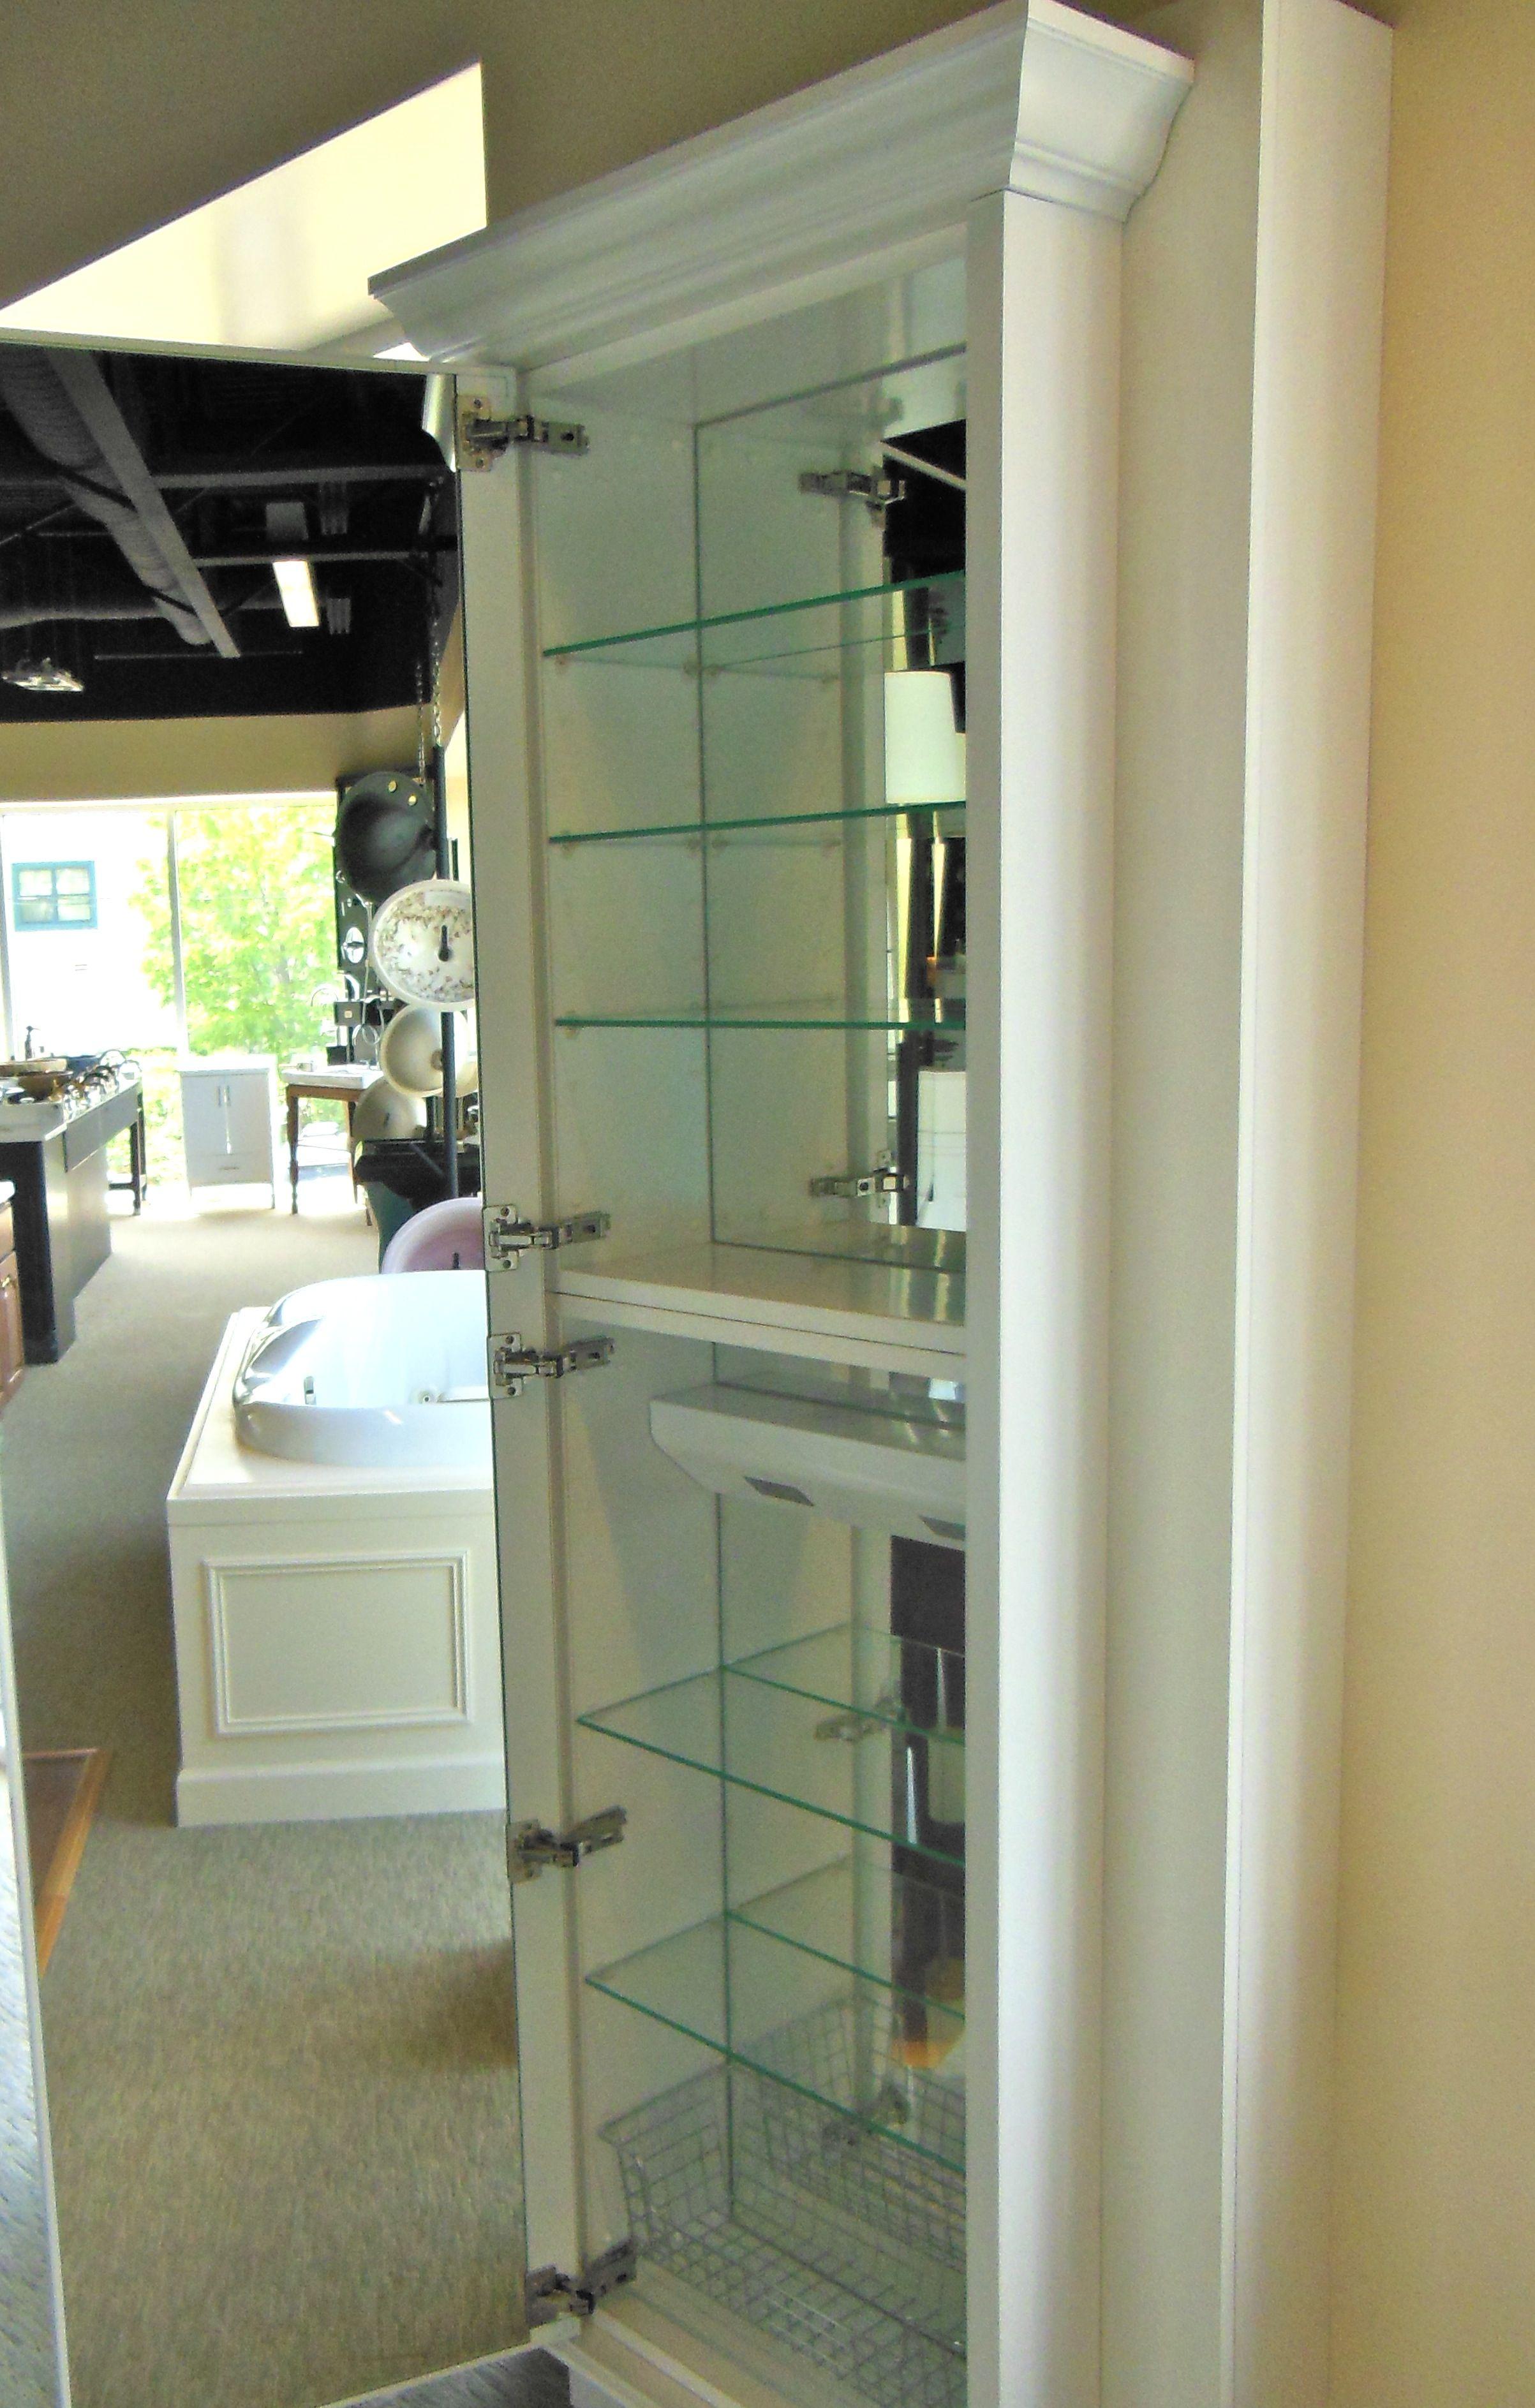 Amazing Love This X Large Medicine Cabinet... Designing Our Bathroom Remodel.